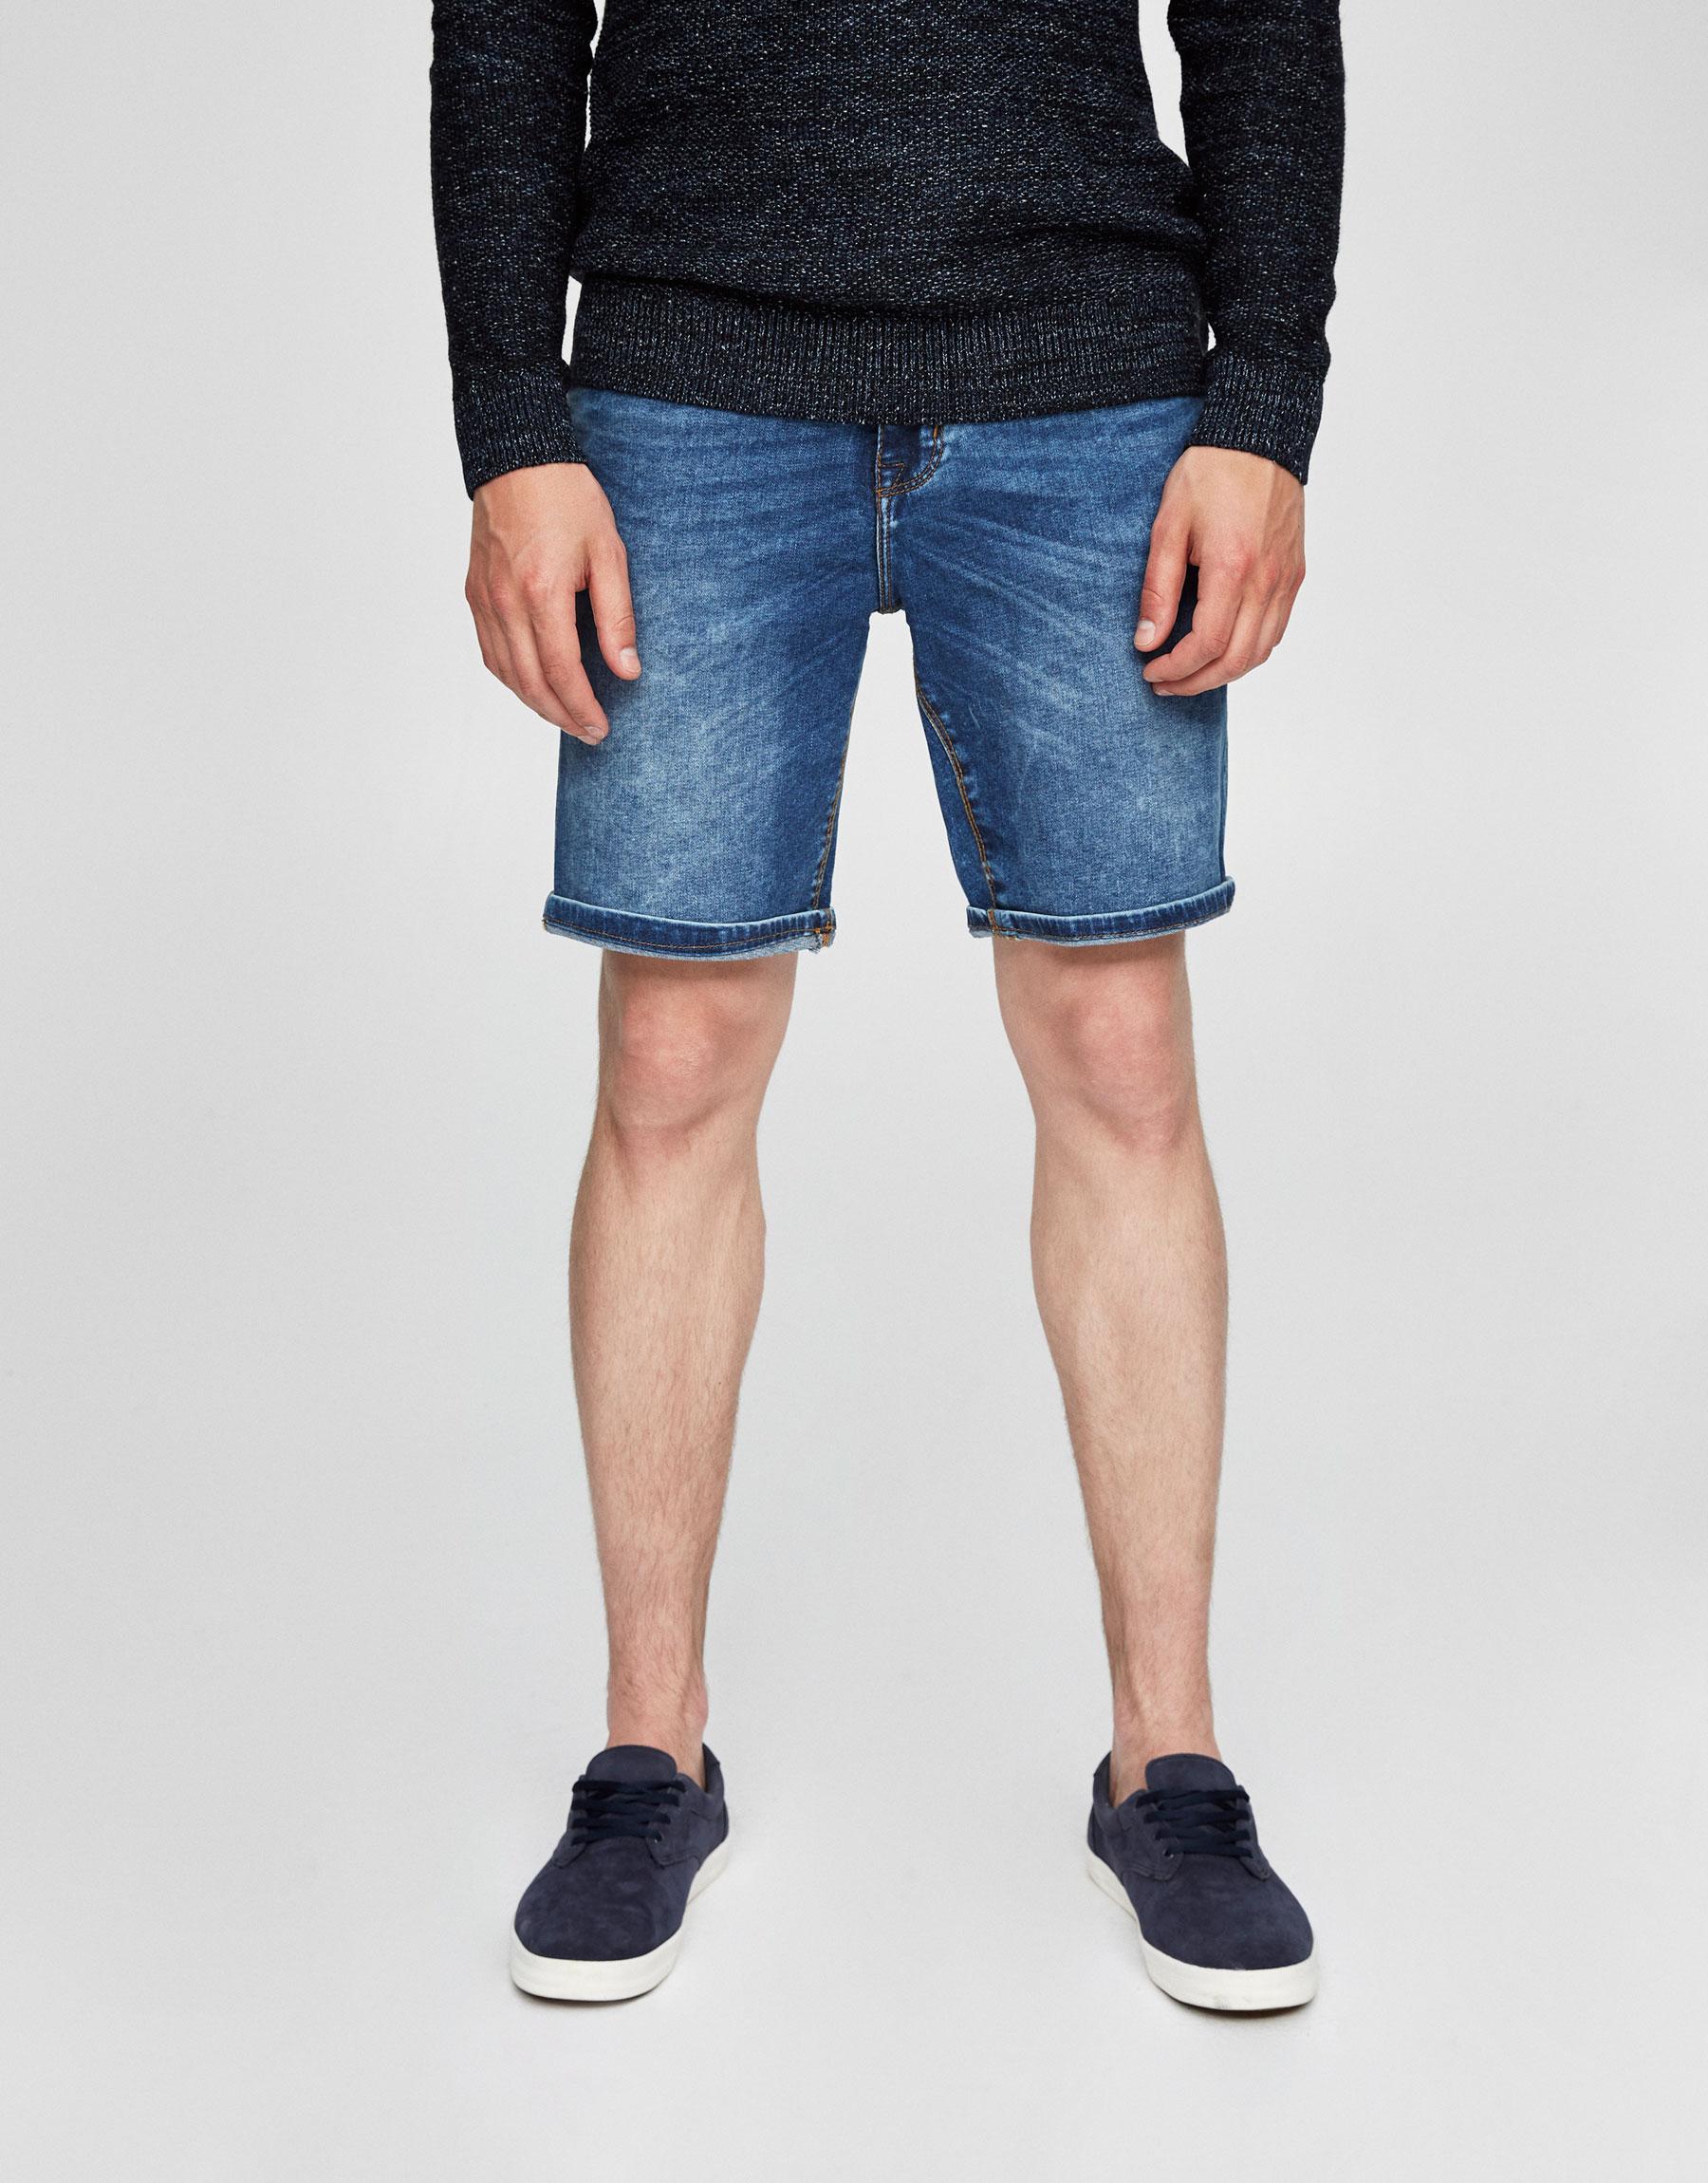 Faded blue denim Bermuda shorts